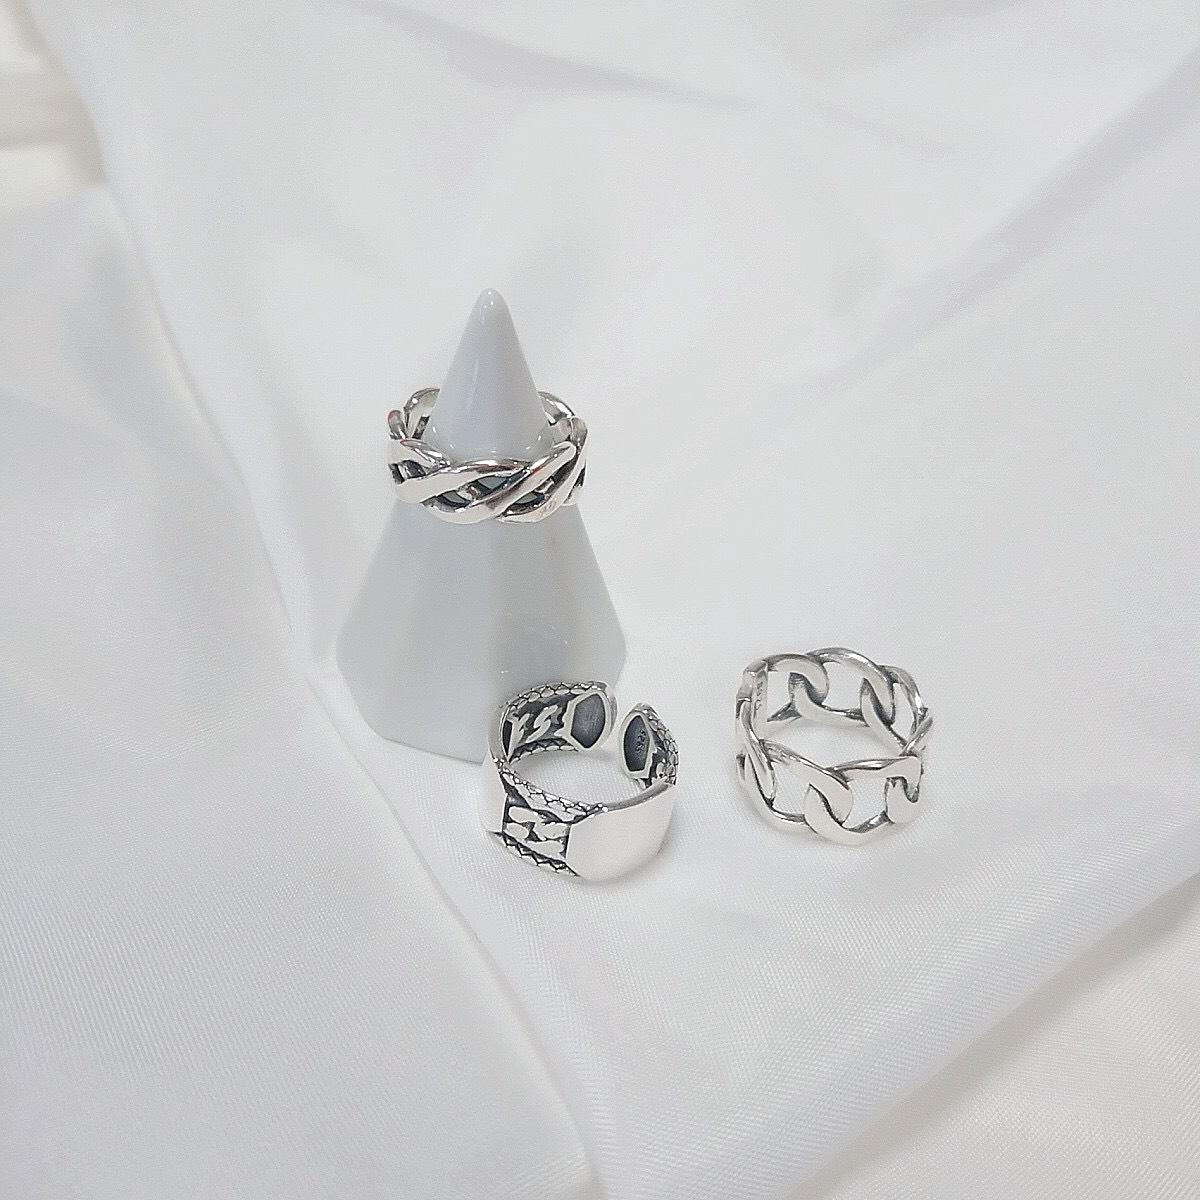 【silver925】メンズライクなデザインシルバーリング✨✨